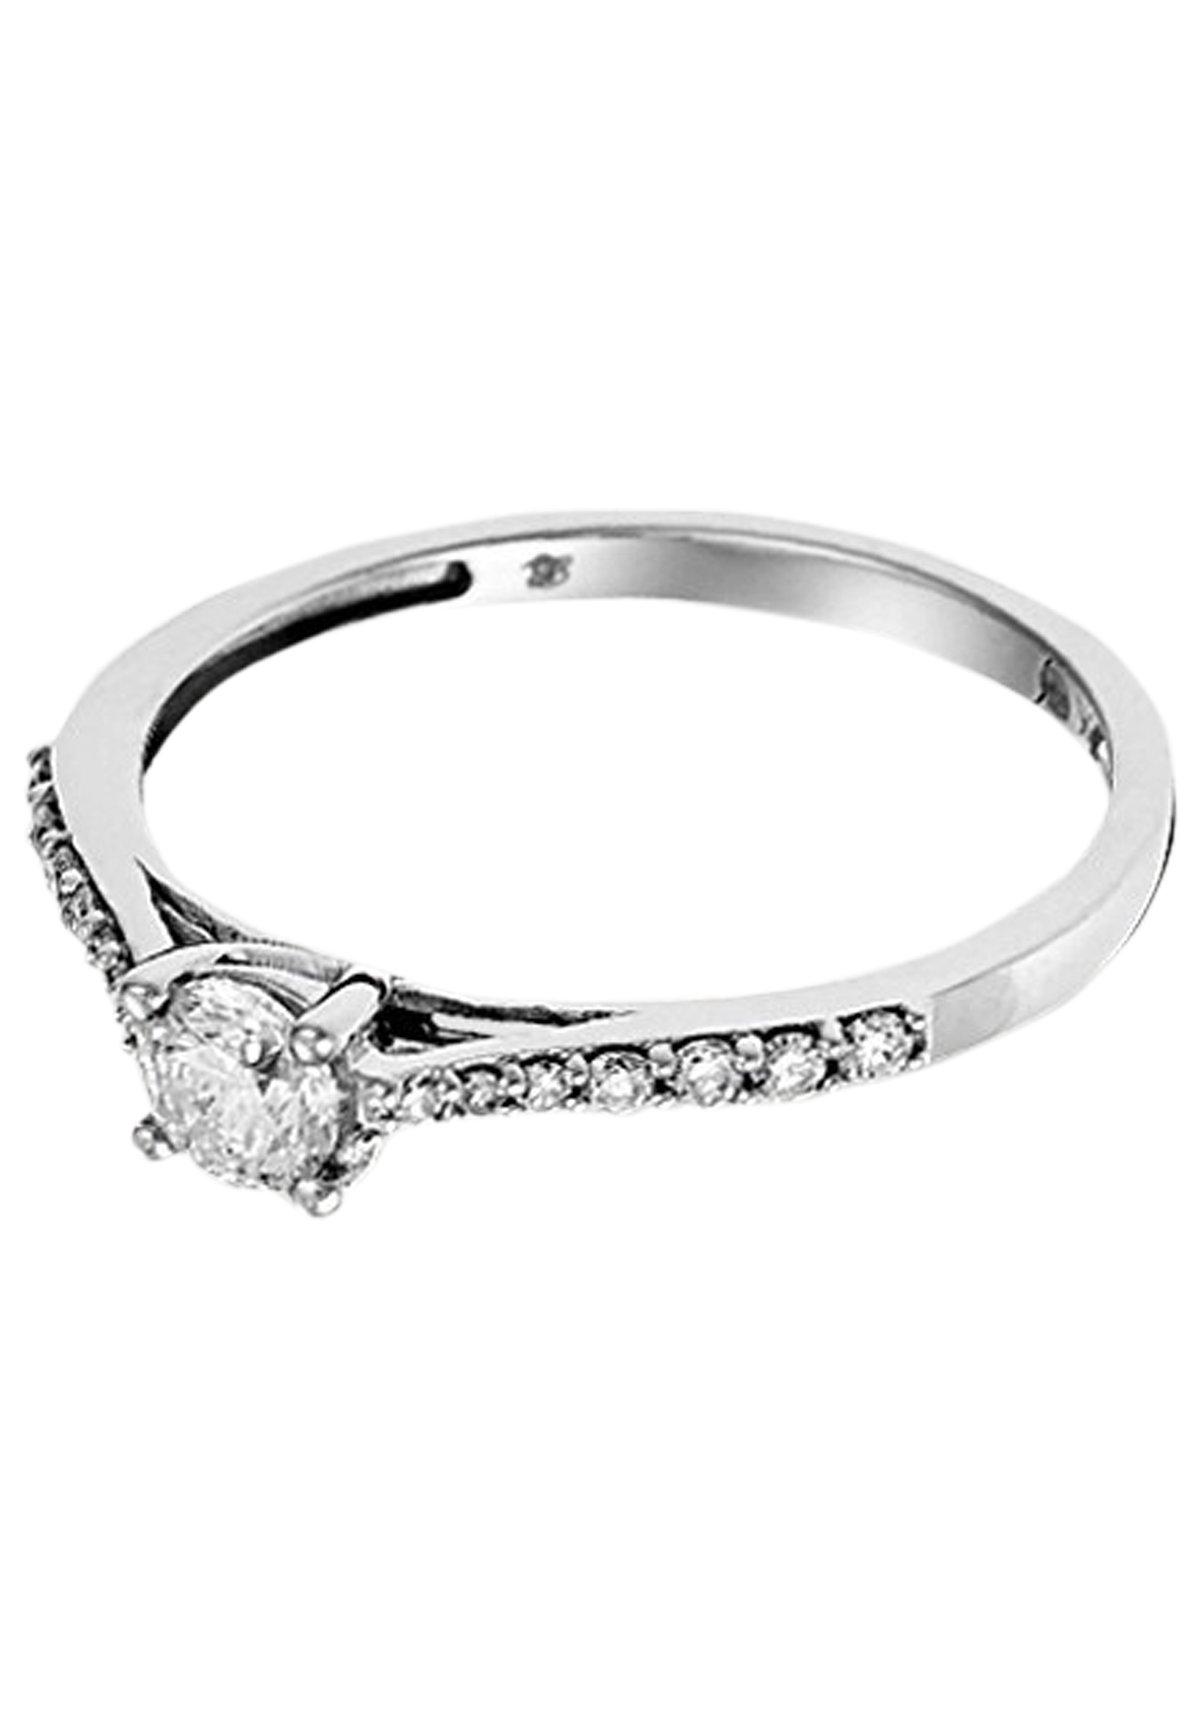 Mujer WHITE GOLD RING 18K CERTIFIED 15 DIAMONDS HSI AND 14 DIAMONDS 0.10 CT - Anillo